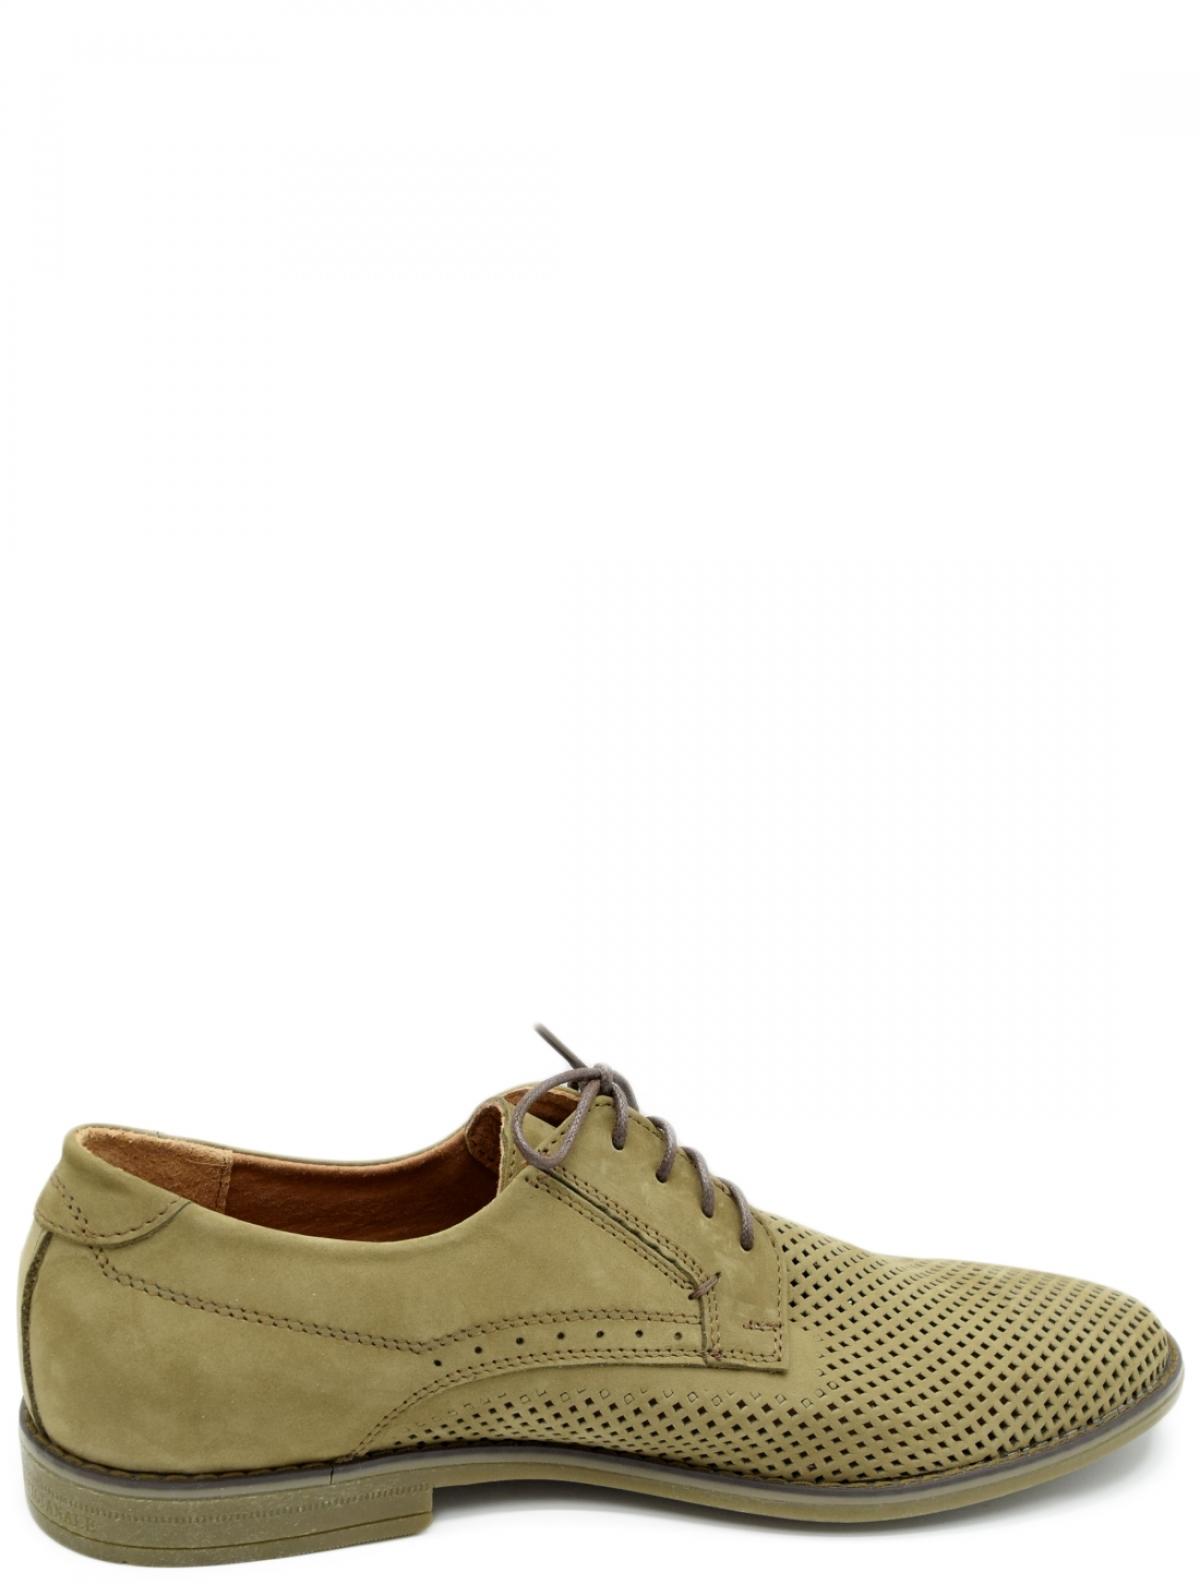 Fossa 446-20-07 мужские туфли